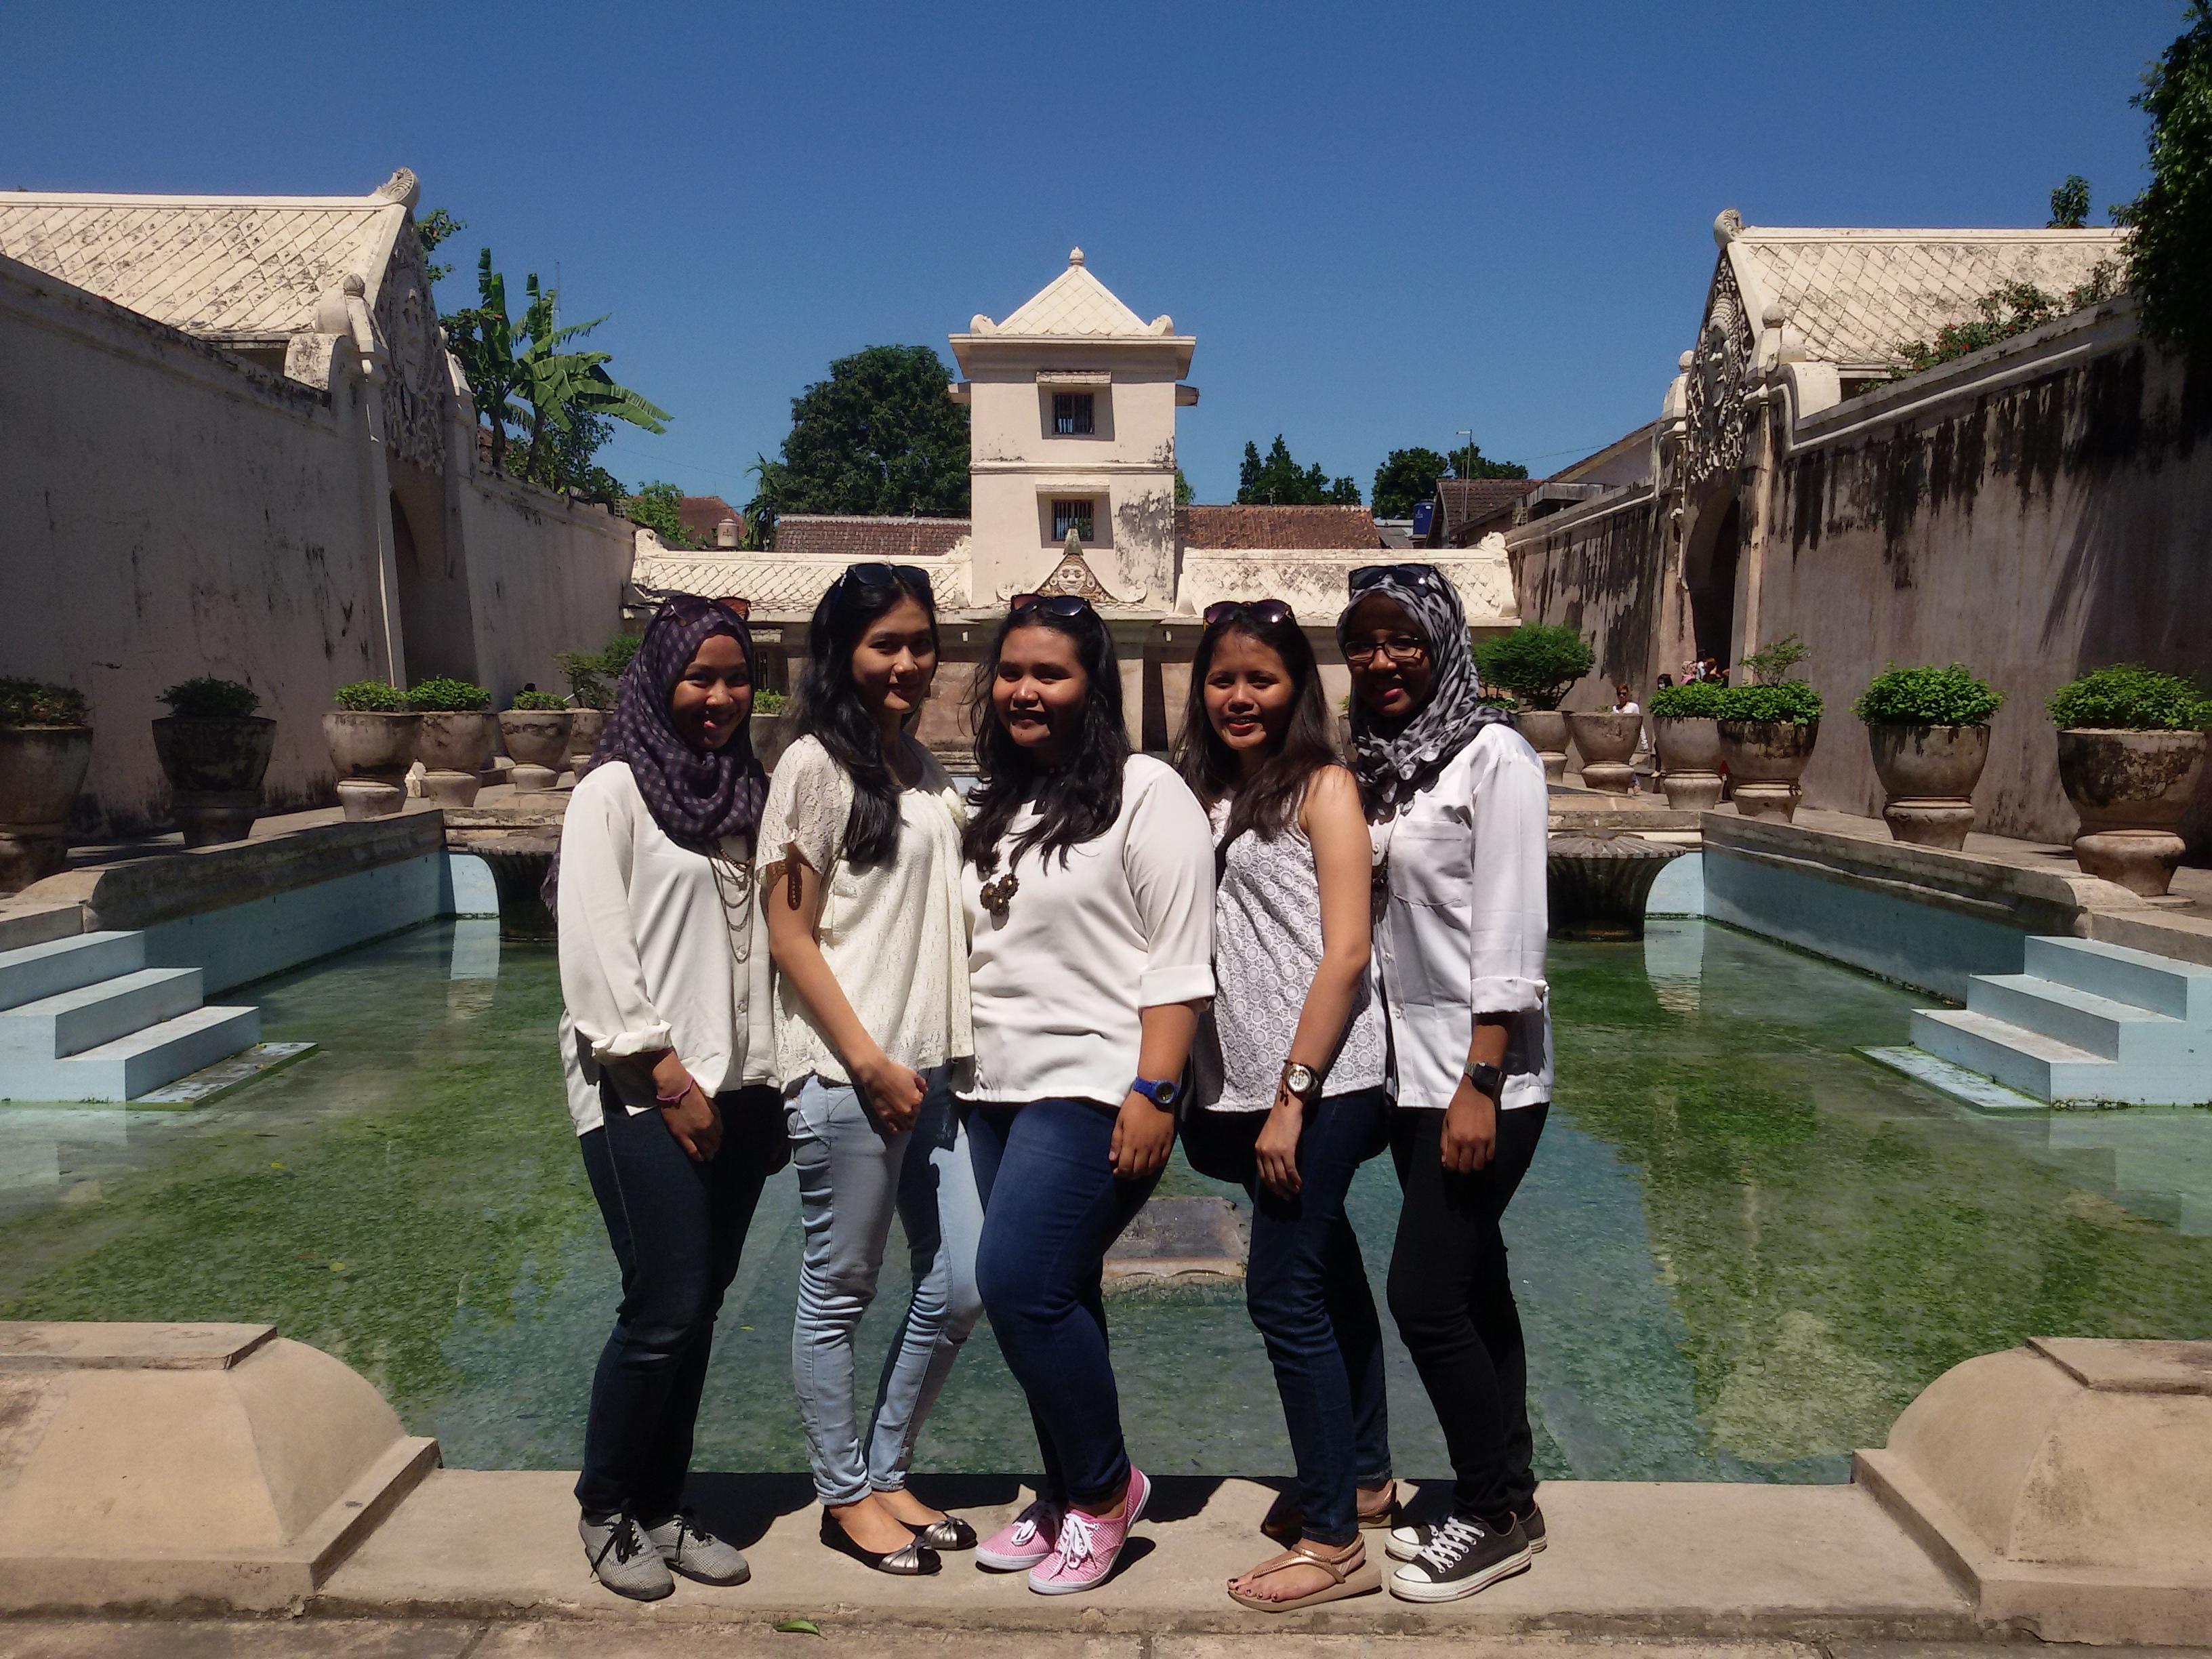 Taman Sari Water Castle Benteng Vredeburg Syarifa Umihani Kota Yogyakarta